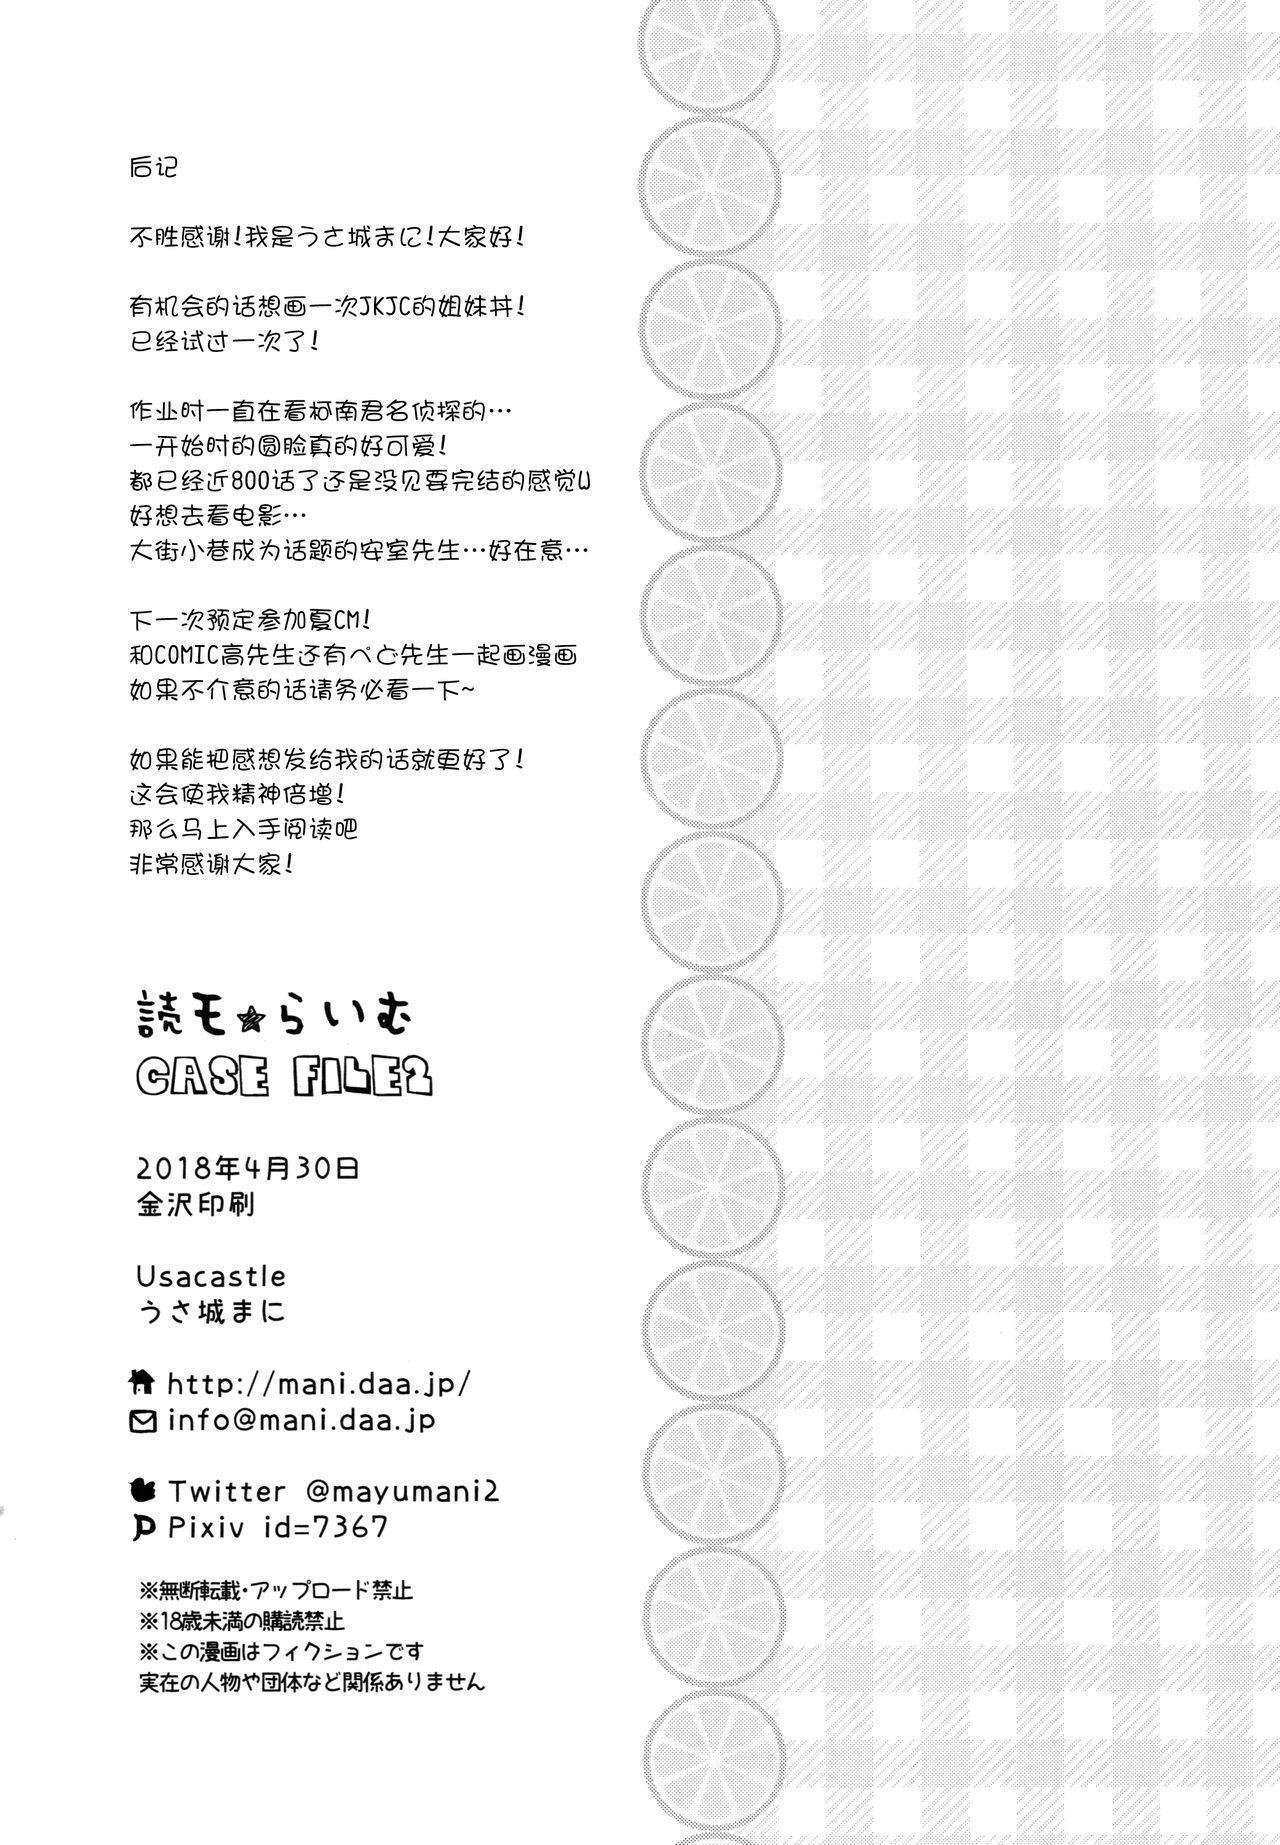 Dokumo Lime CASE FILE 2 25